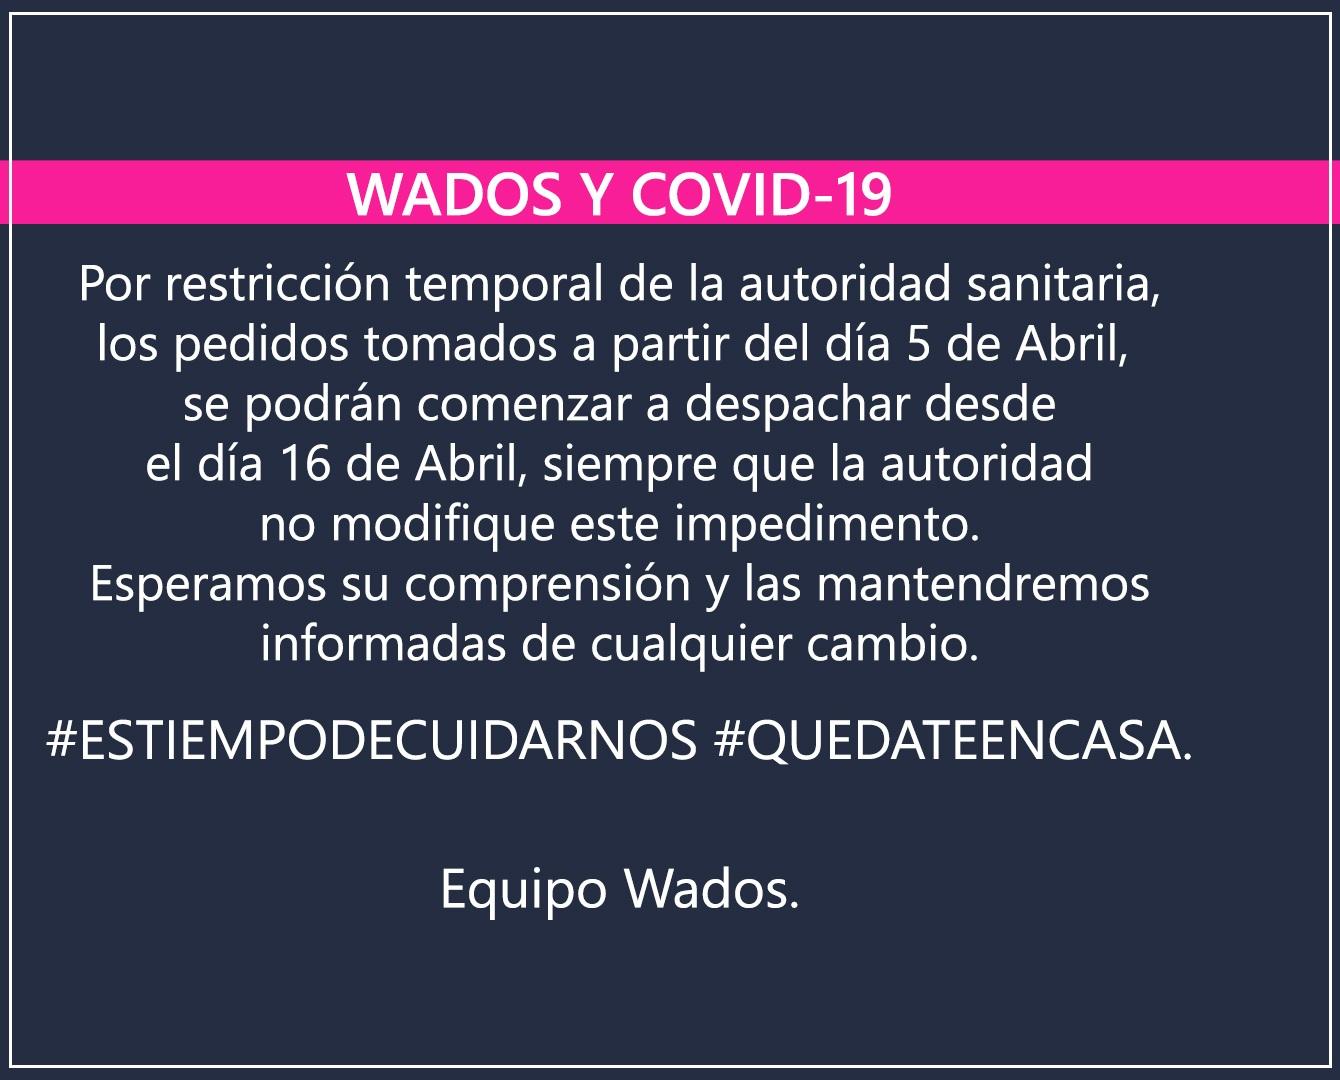 Wados.cl